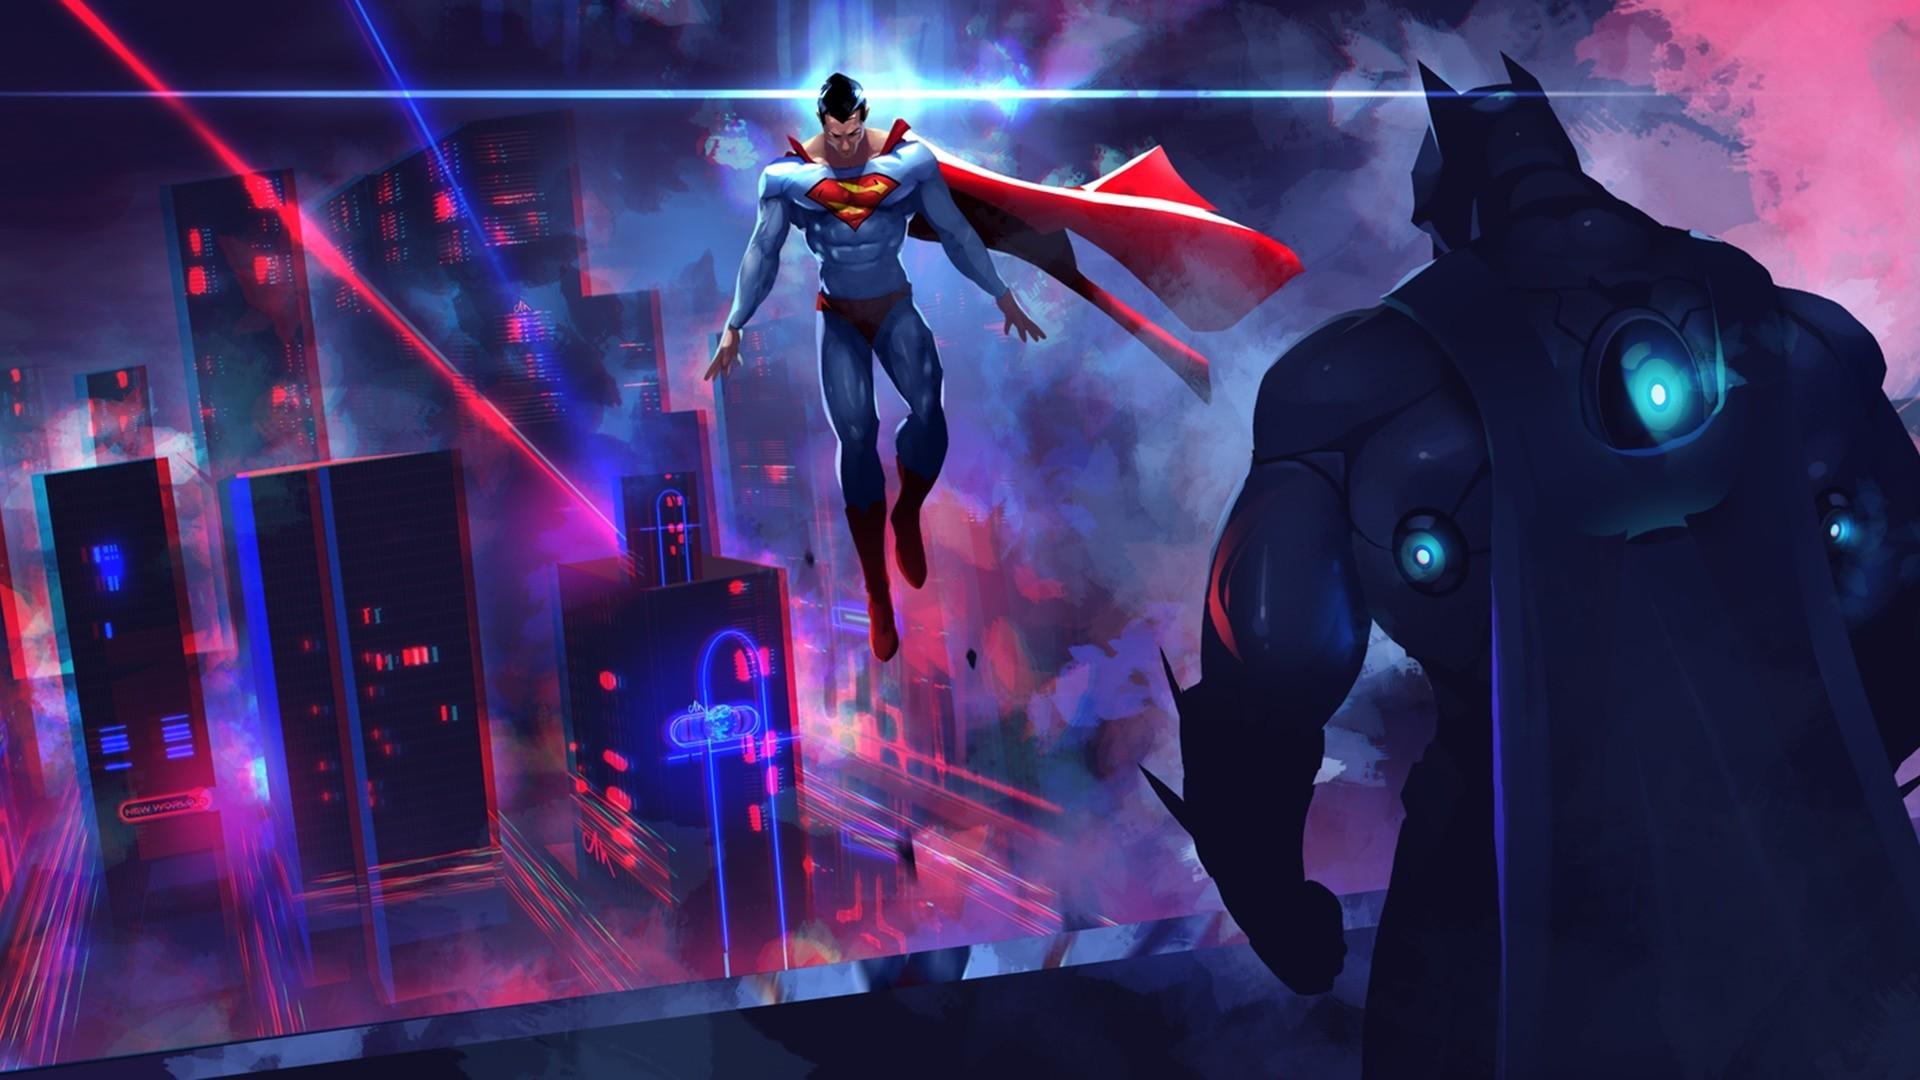 Batman Vs Superman Neon Lights Artwork